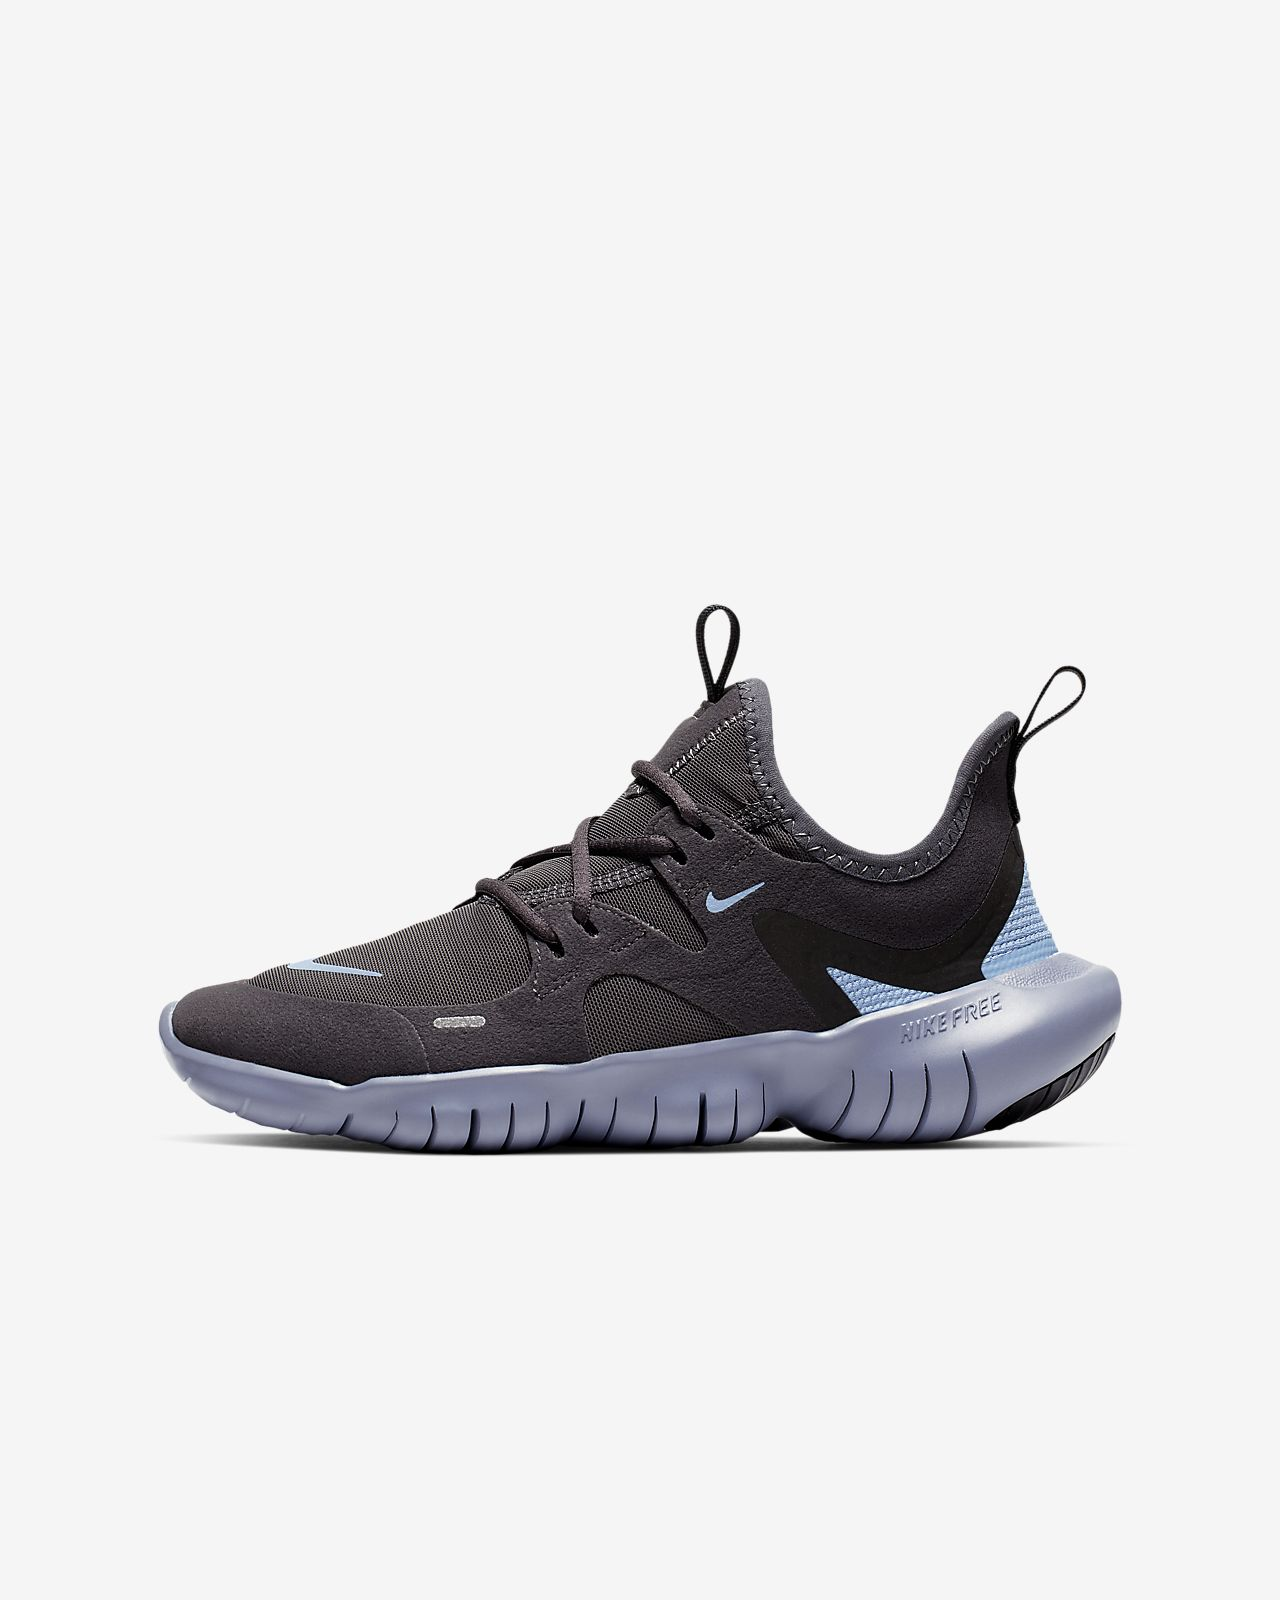 Nike Free RN 5.0 Hardloopschoen voor kids